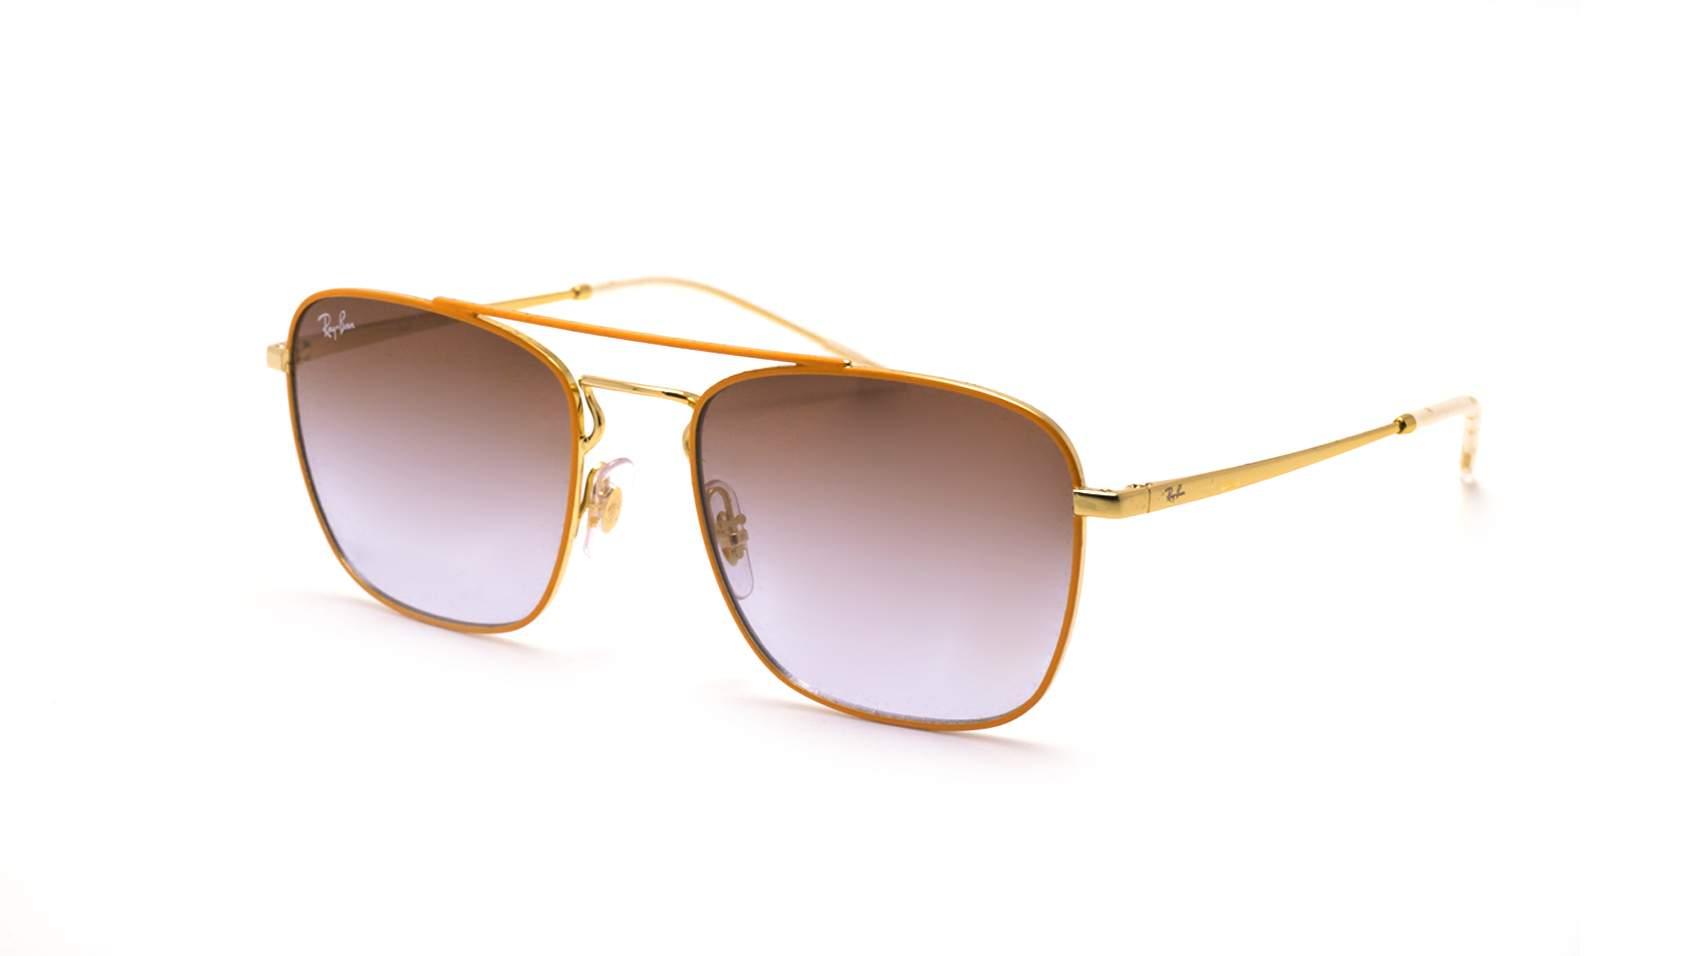 6868d856549 Sunglasses Ray-Ban RB3588 90612W 55-19 Orange Medium Gradient